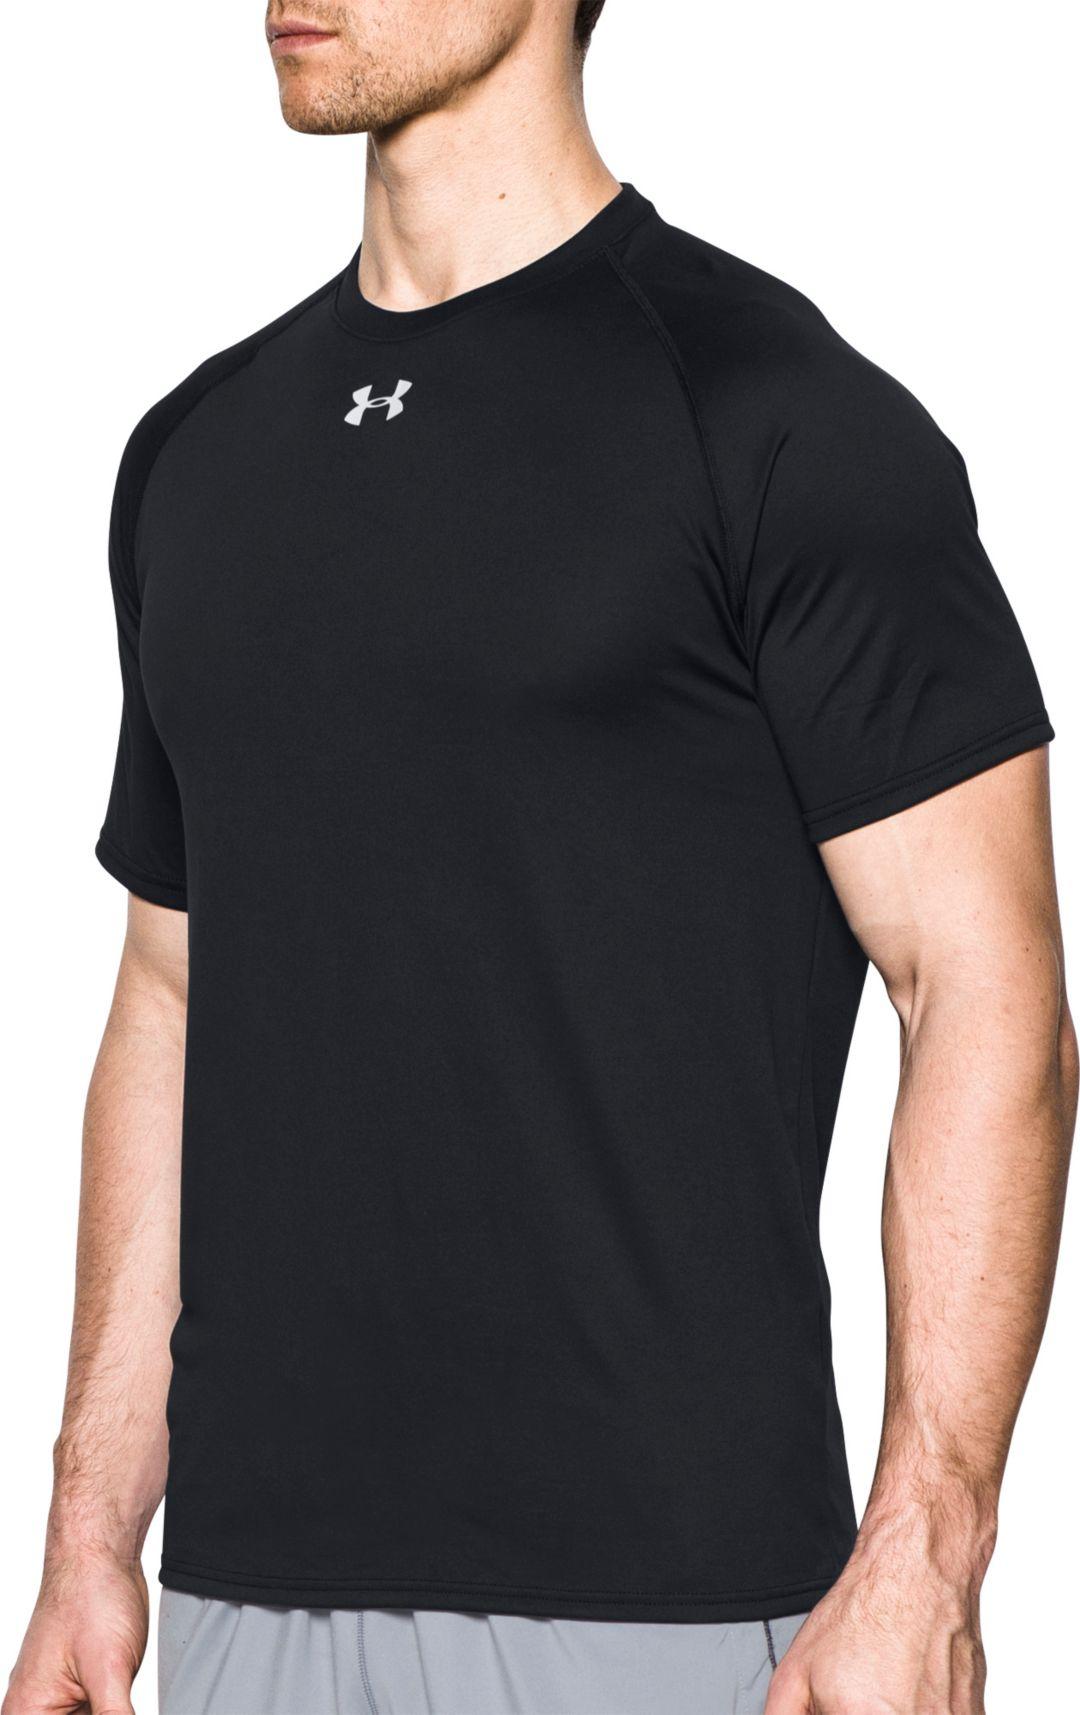 49f747cc Under Armour Men's Locker T-Shirt. noImageFound. Previous. 1. 2. 3